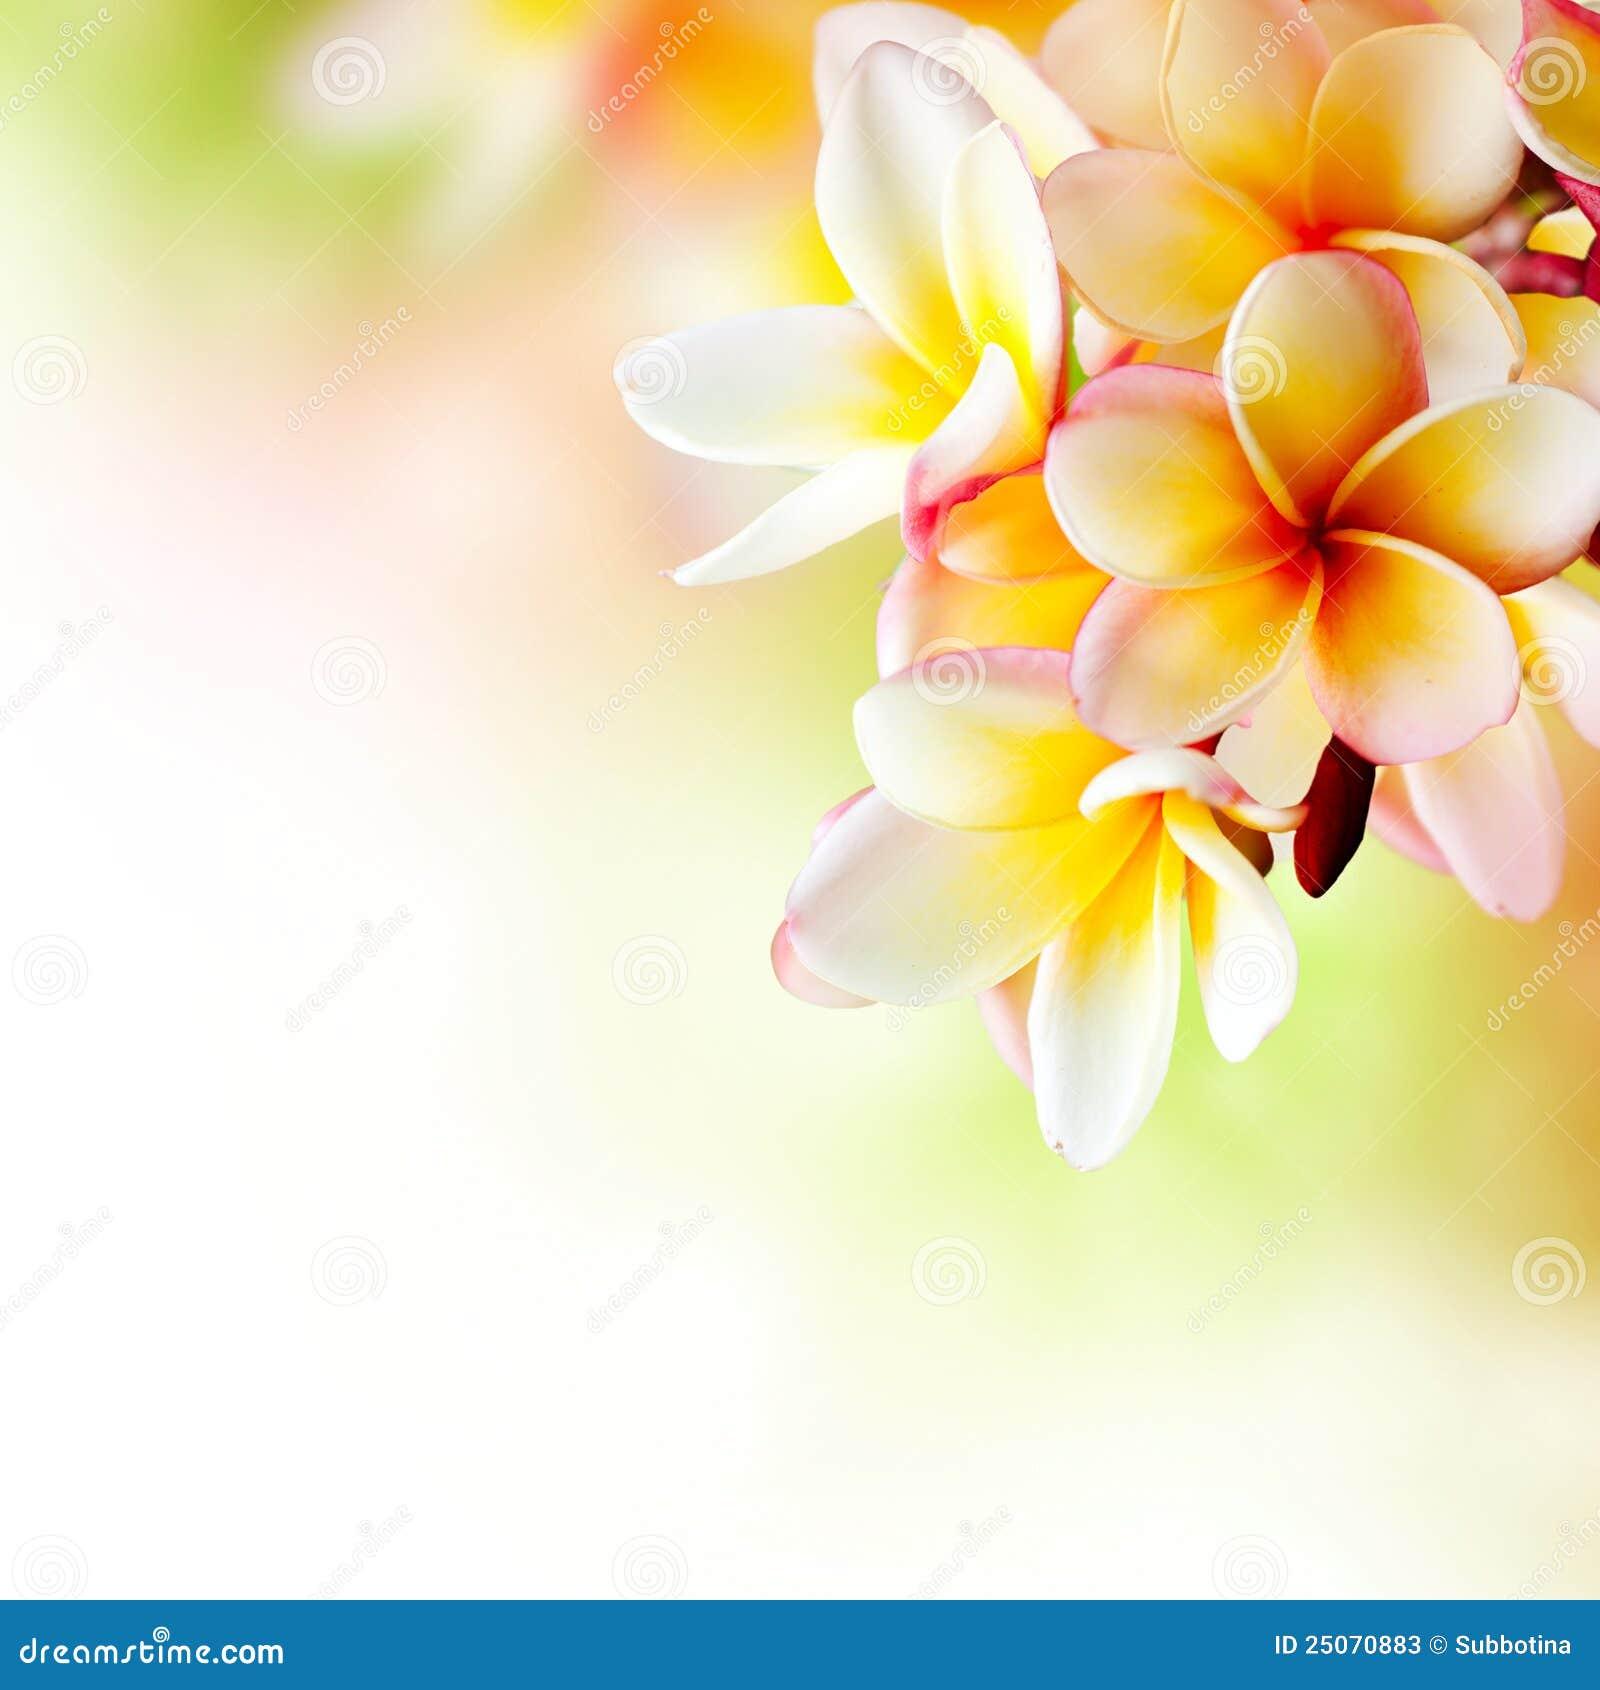 Frangipani spa flowers stock photo image 14654190 - Frangipani Tropical Spa Flower Stock Photos